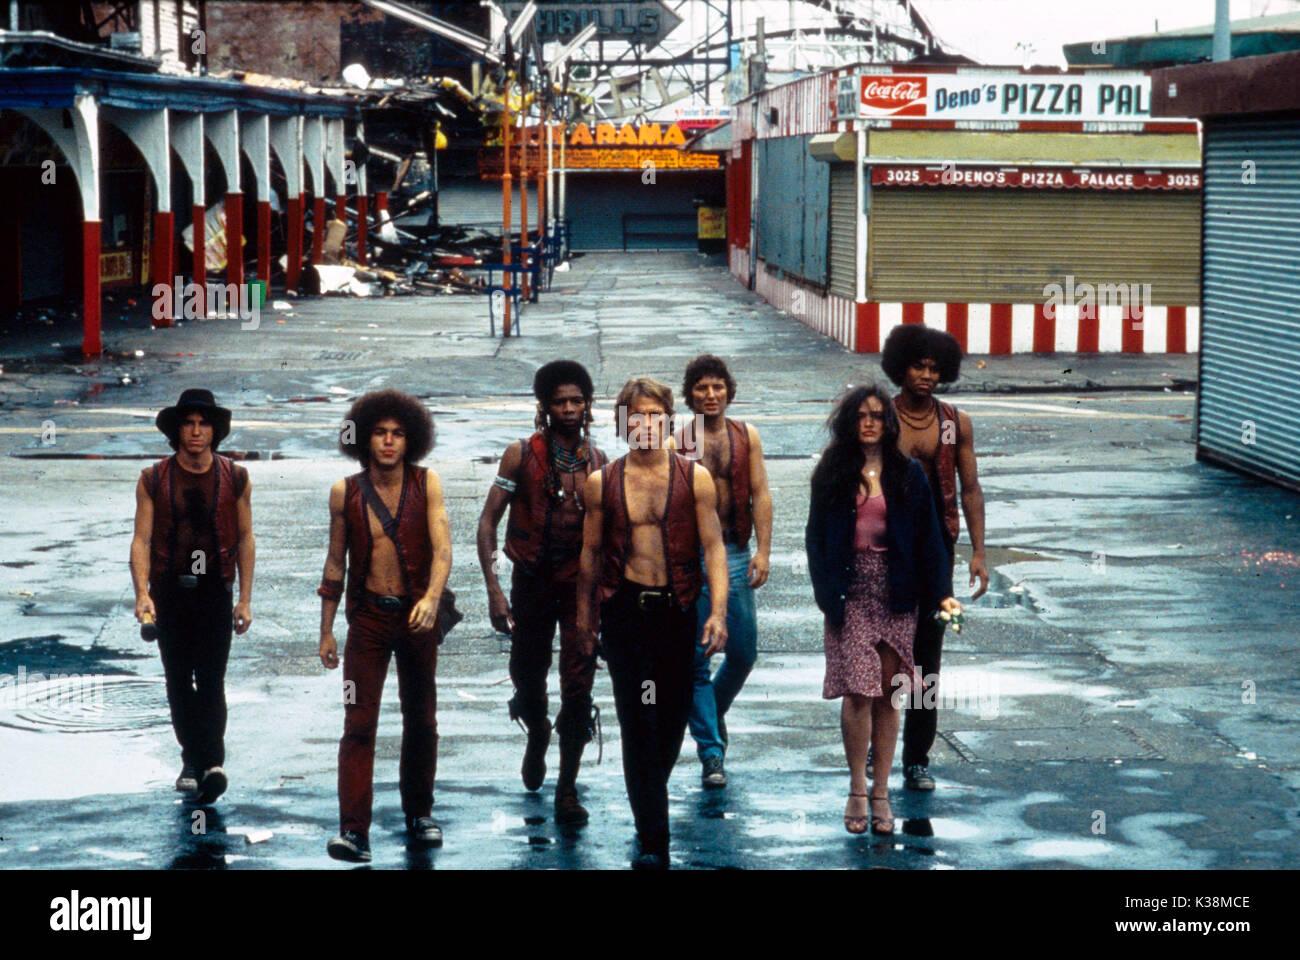 THE WARRIORS [?], [?], DAVID HARRIS, MICHAEL BECK, [?], DEBORAH VAN VALKENBURGH, BRIAN TYLER - Stock Image